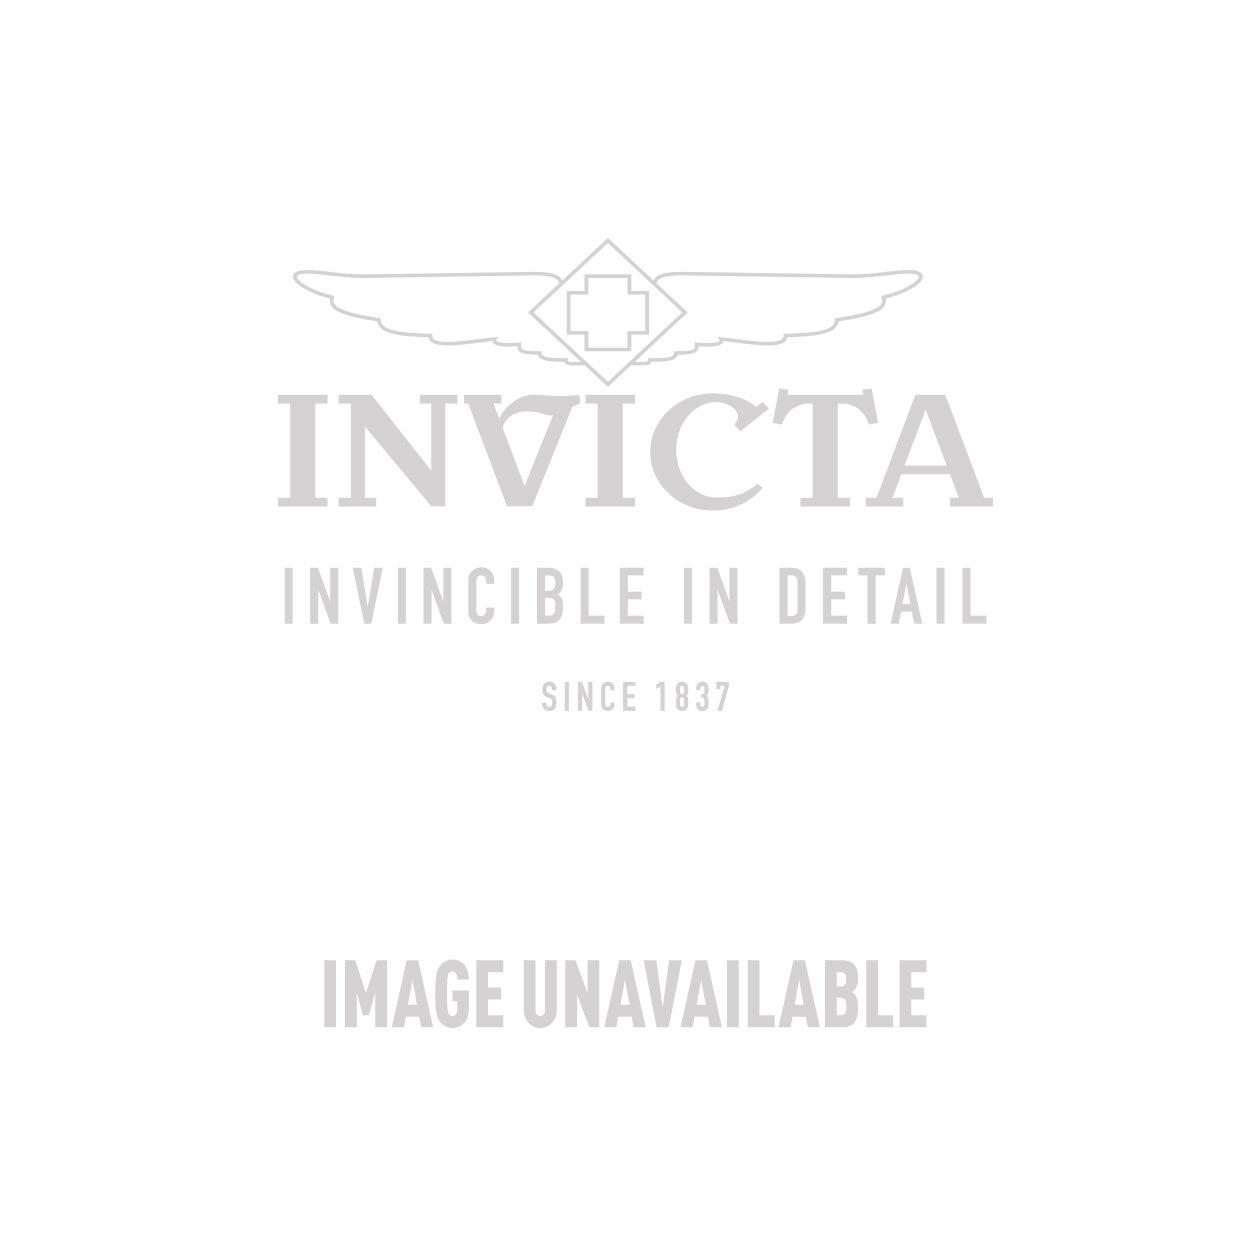 INVICTA Jewelry DORINN Earrings None 9.6 Silver 925 Rhodium+Red - Model J0133